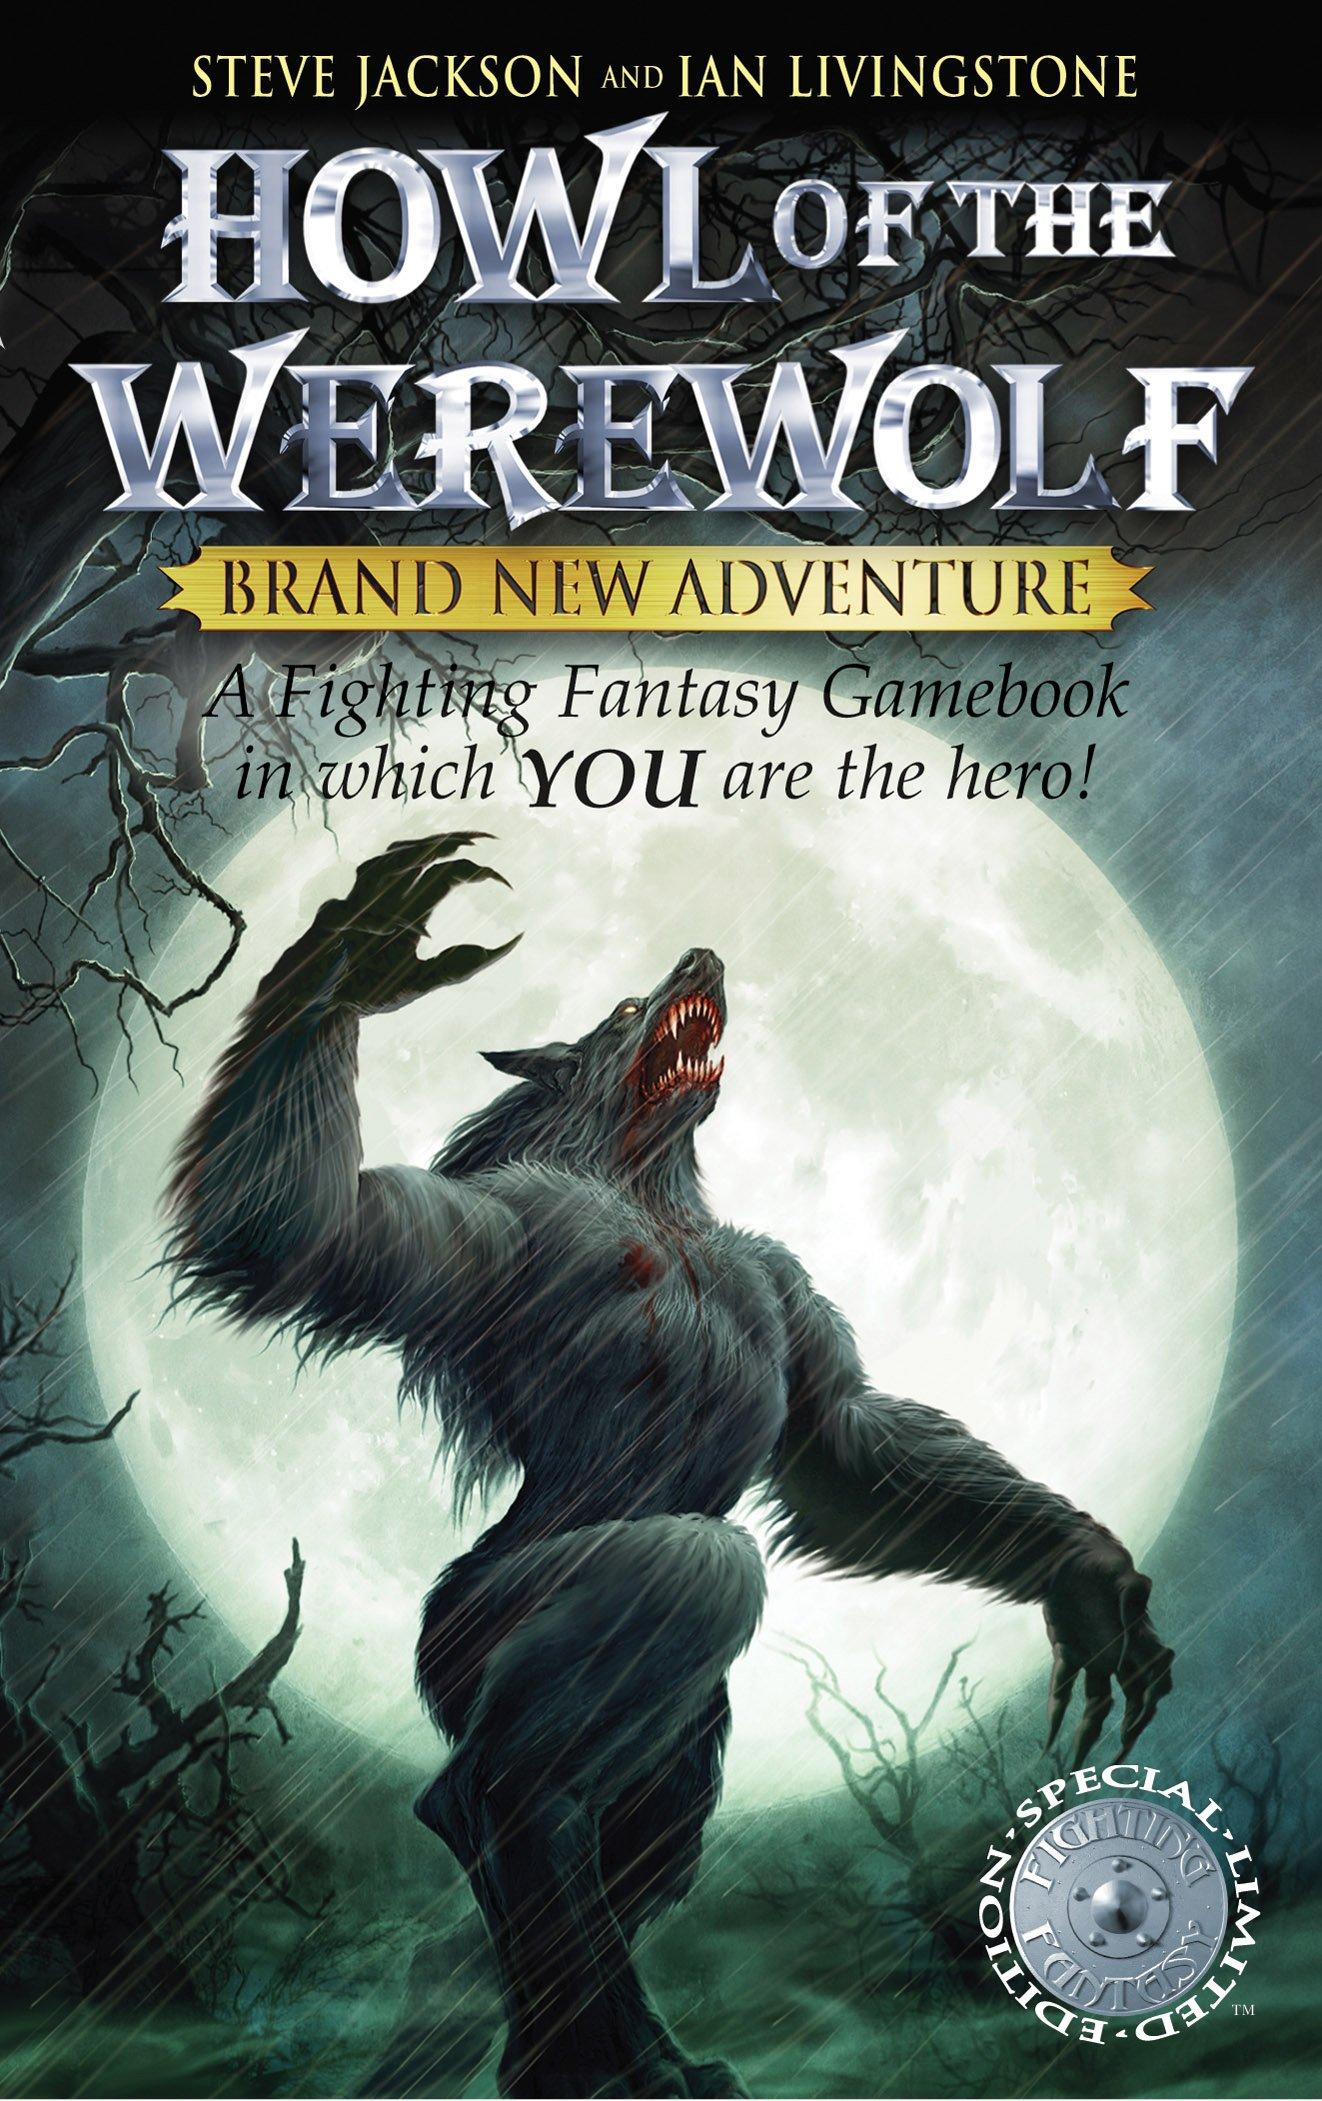 Howl of the Werewolf (Fighting Fantasy S.): Amazon.co.uk: Steve Jackson,  Ian Livingstone: Books